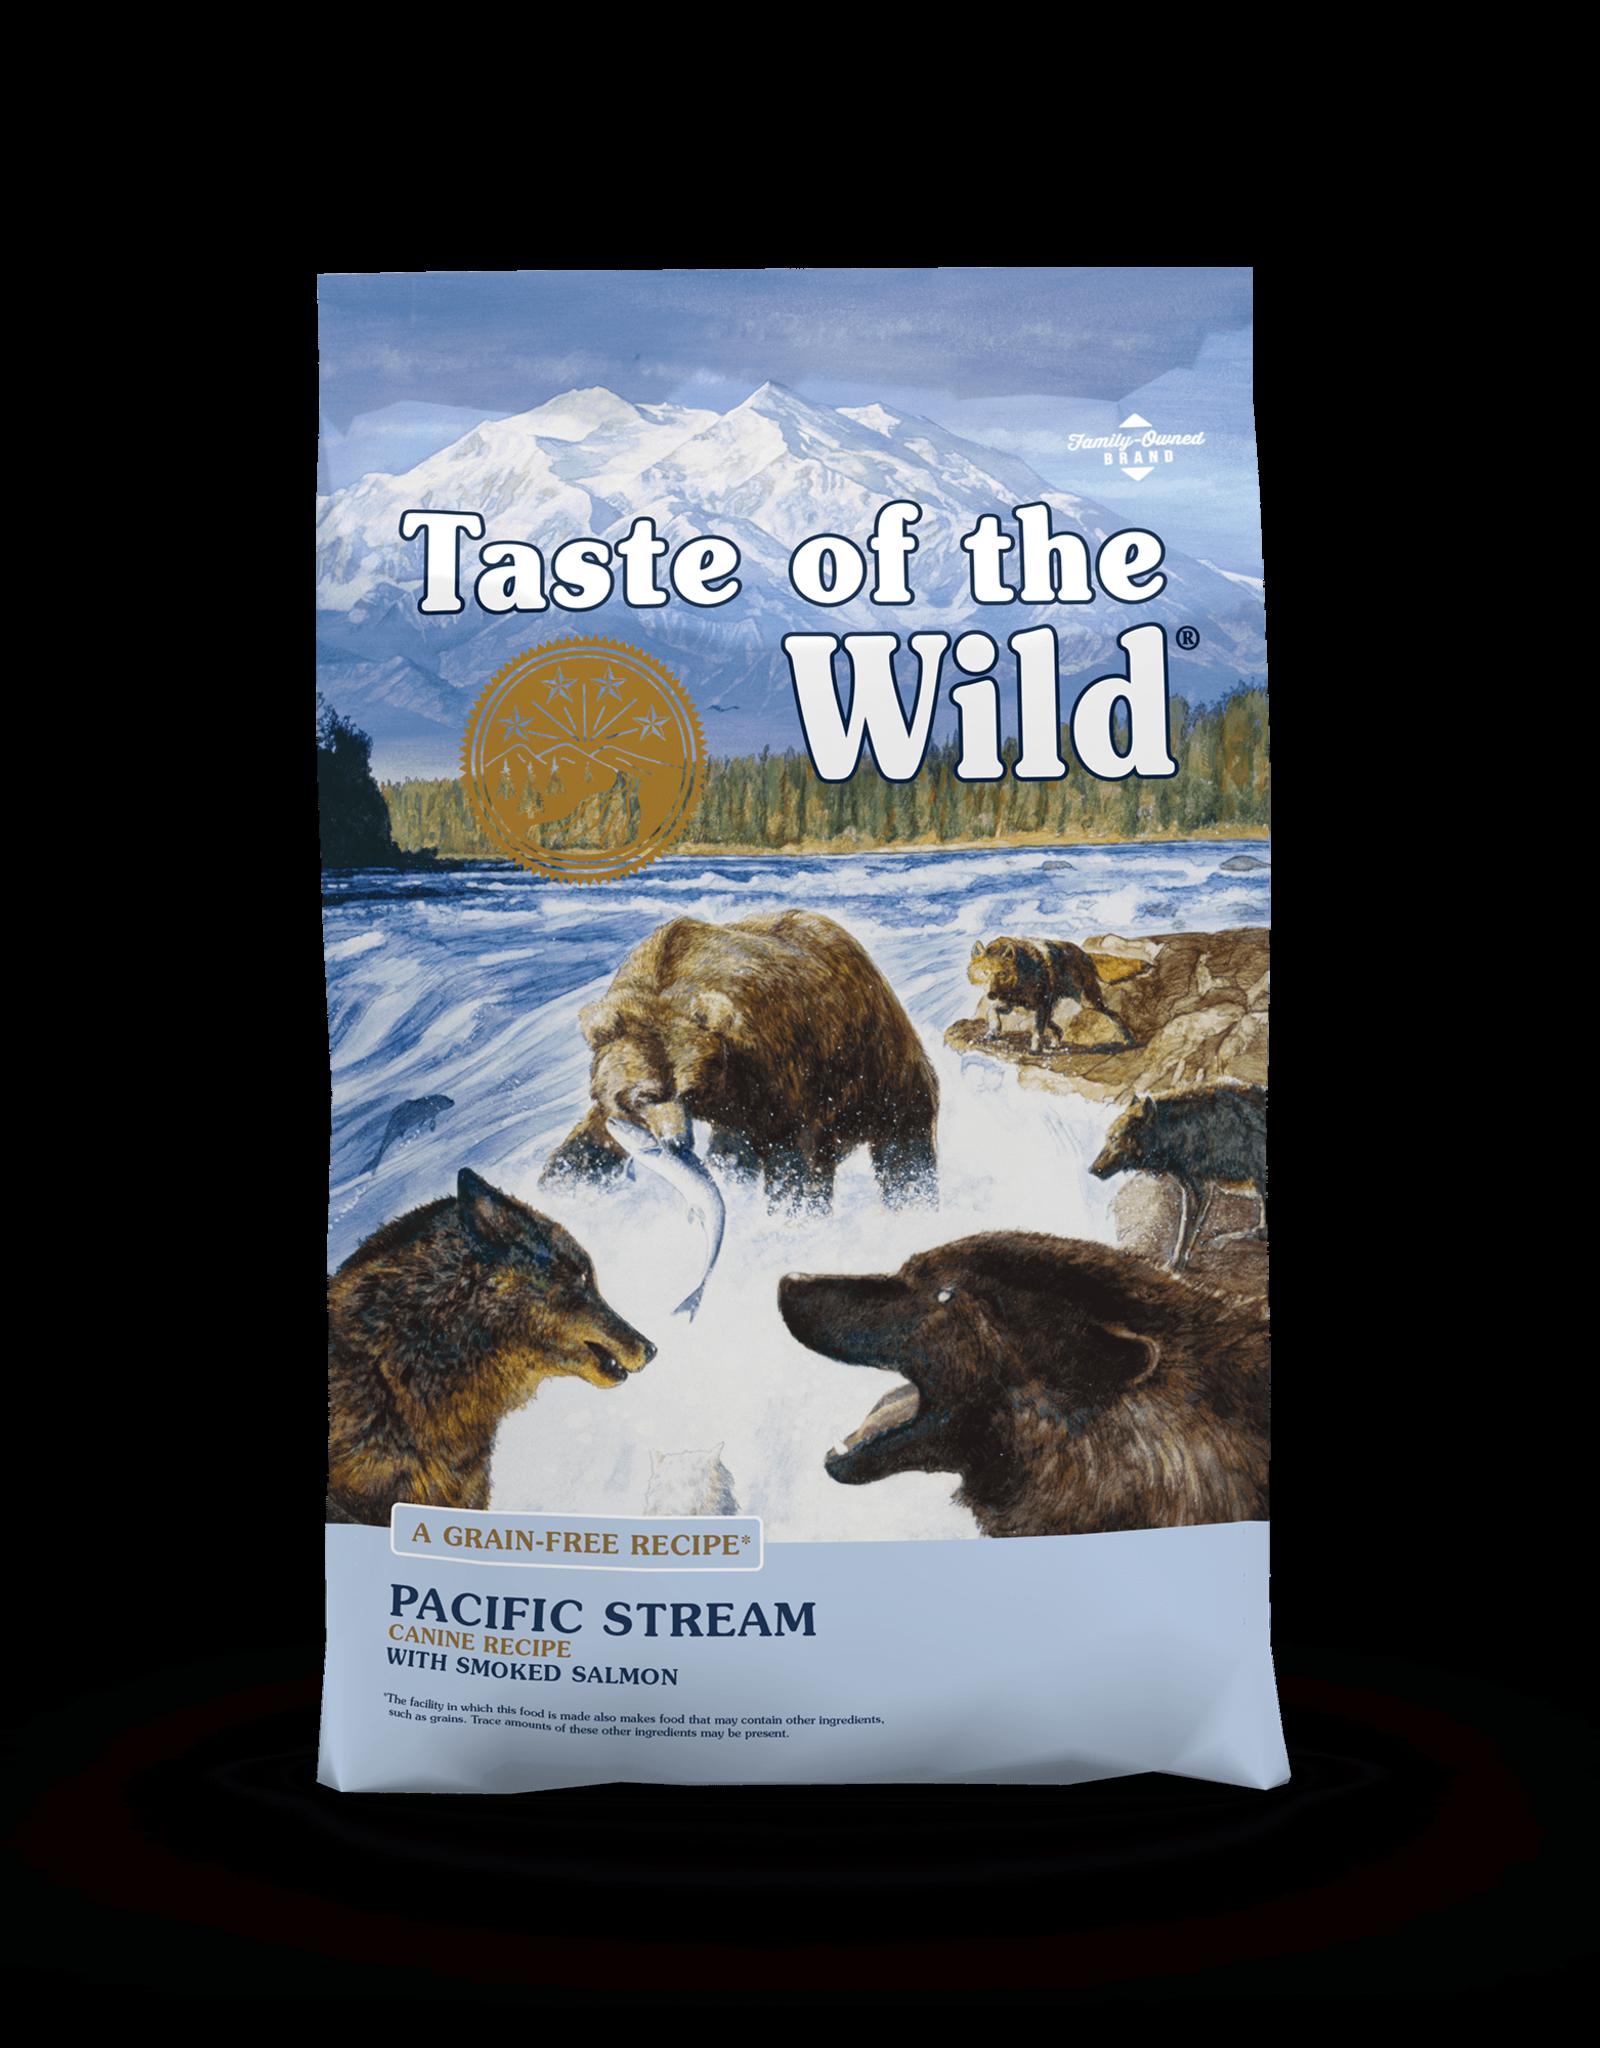 TASTE OF THE WILD Taste of the Wild | Pacific Stream Canine